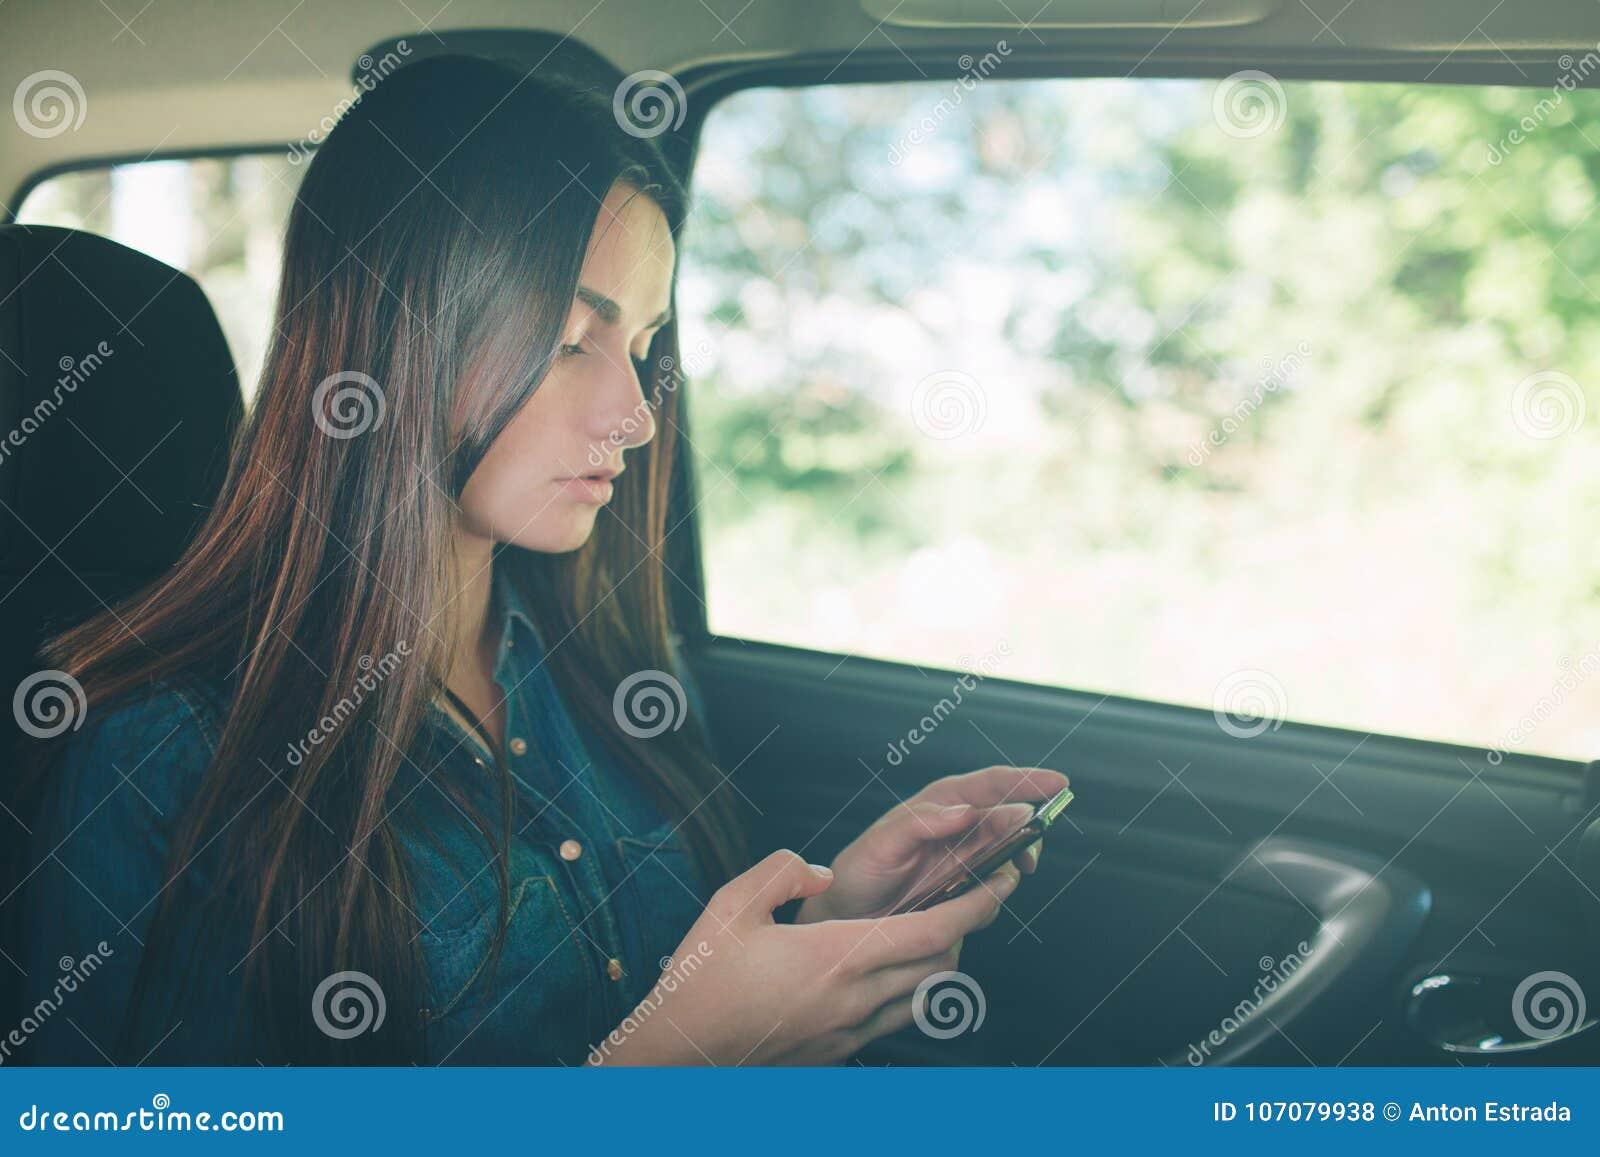 Девушки на задних сидениях в машине фото 1